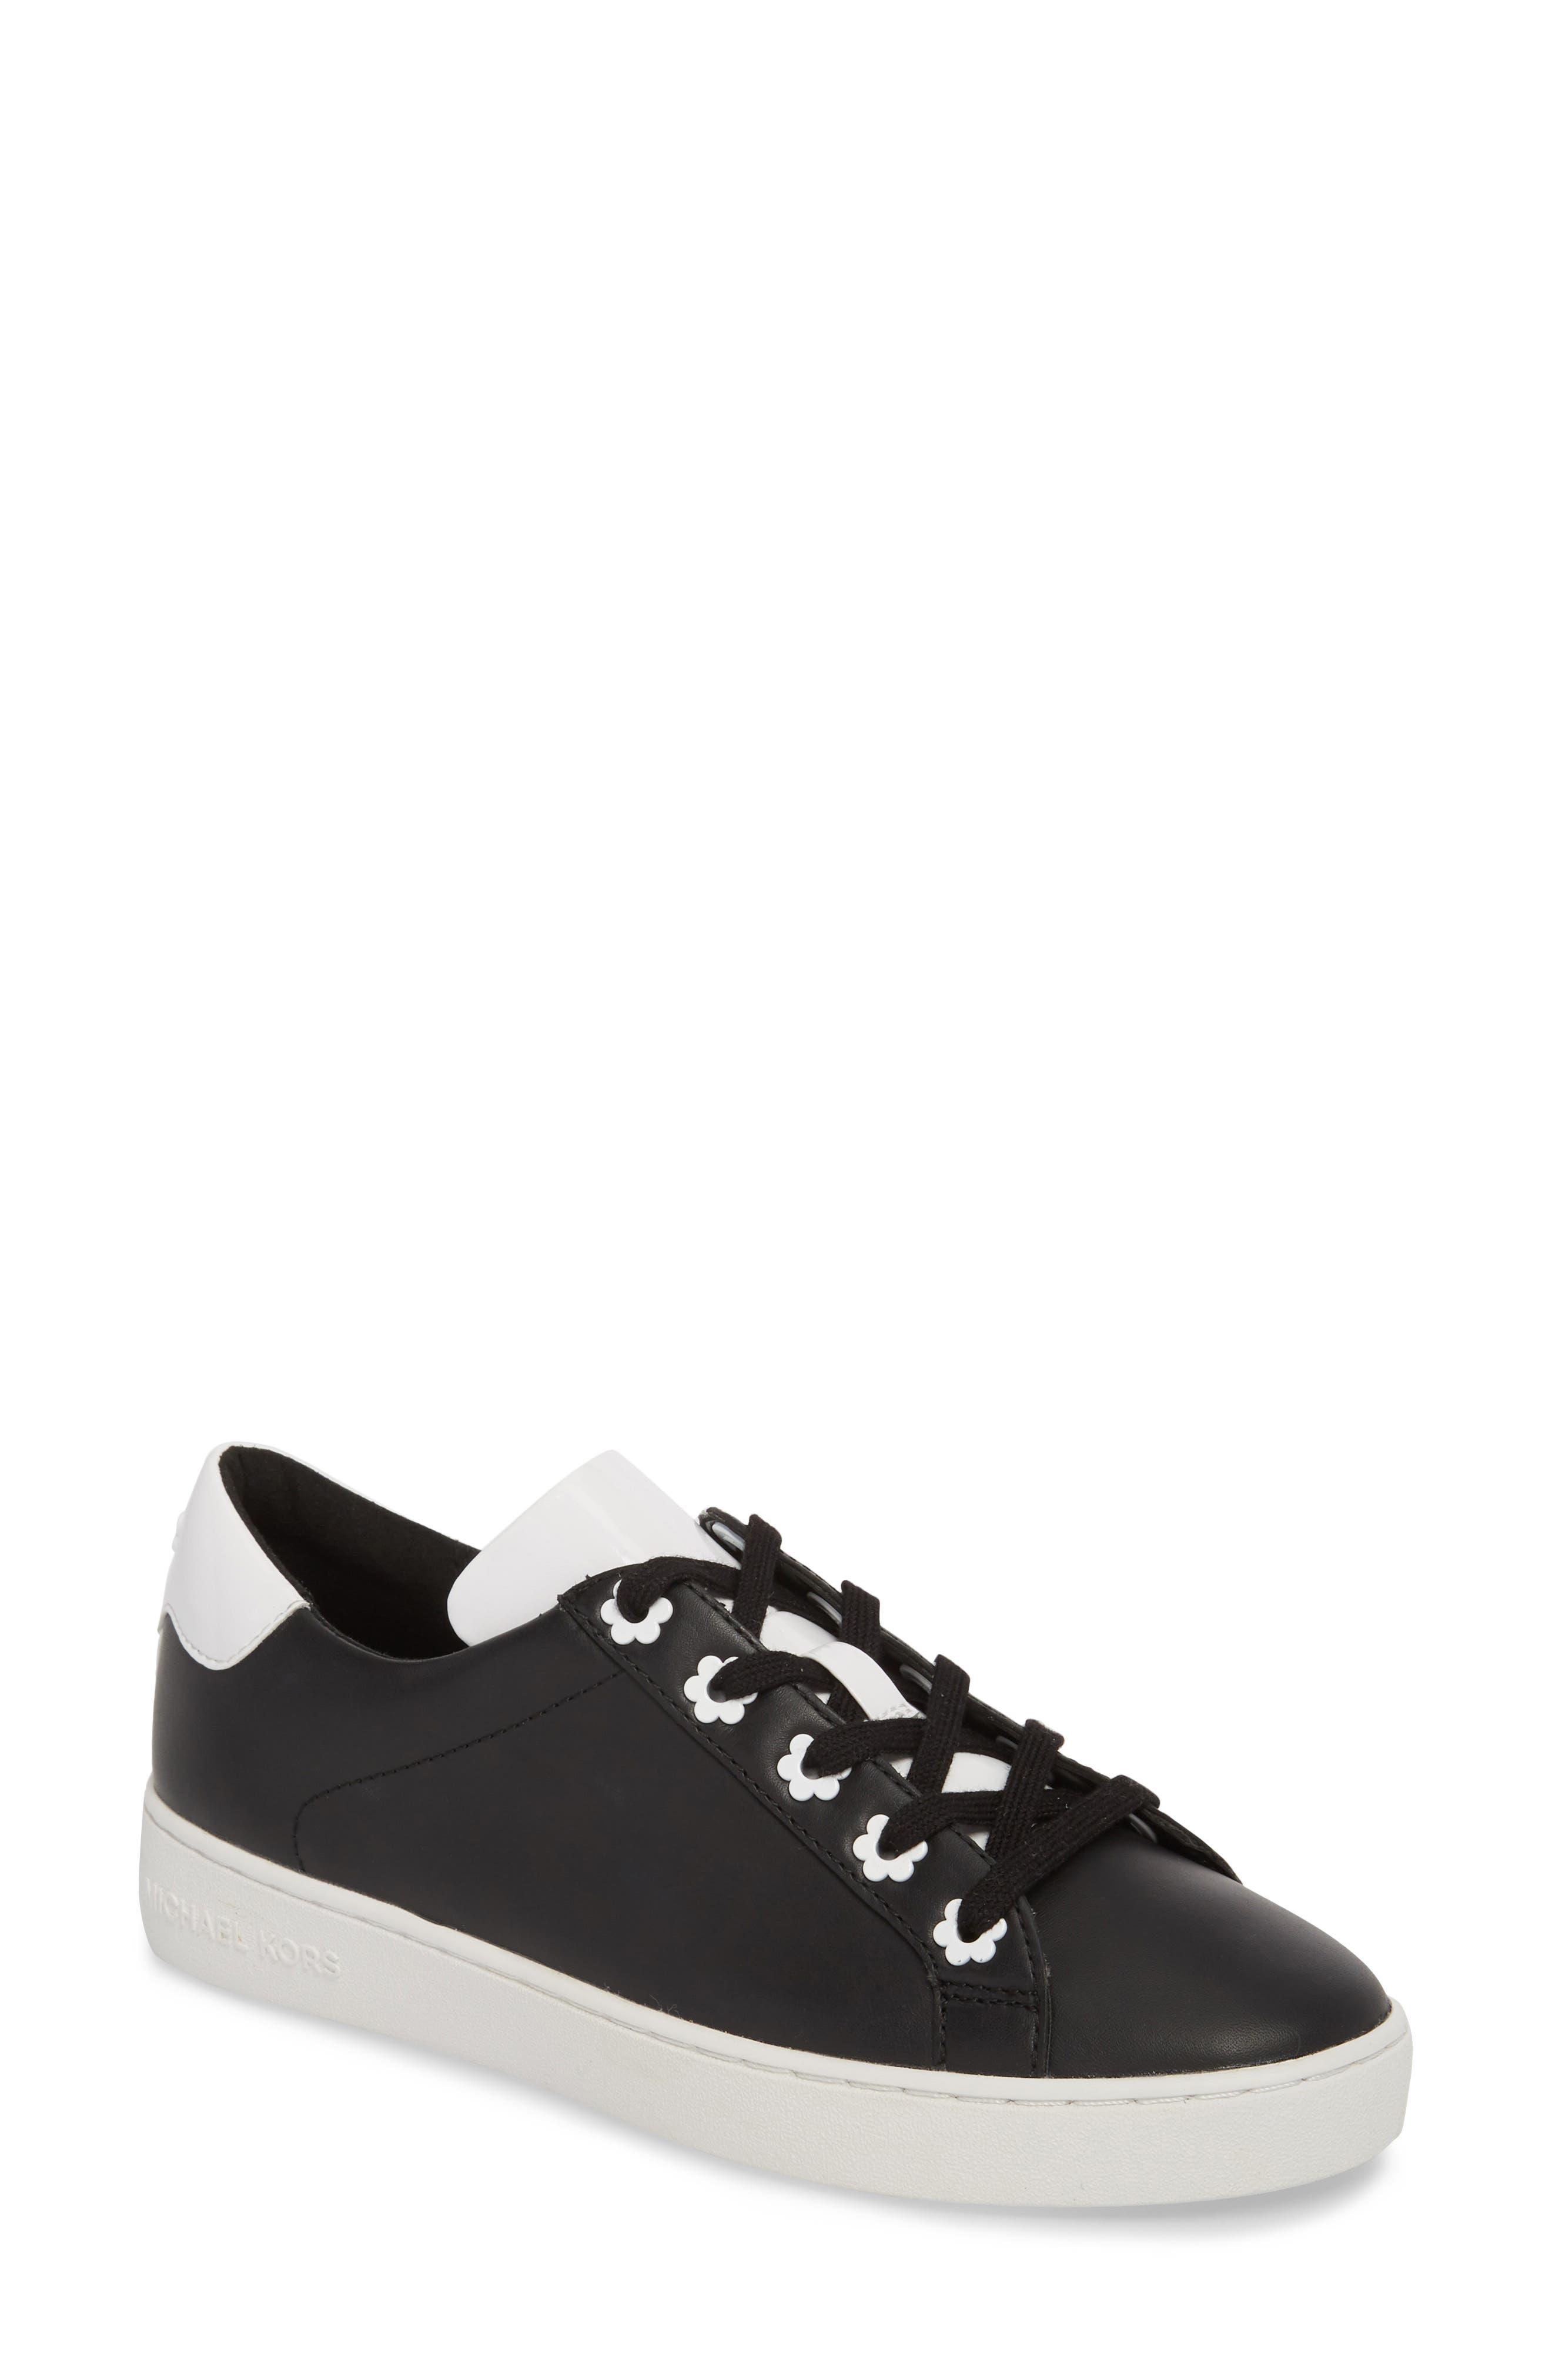 Irving Sneaker,                             Main thumbnail 1, color,                             Black/ Optic White